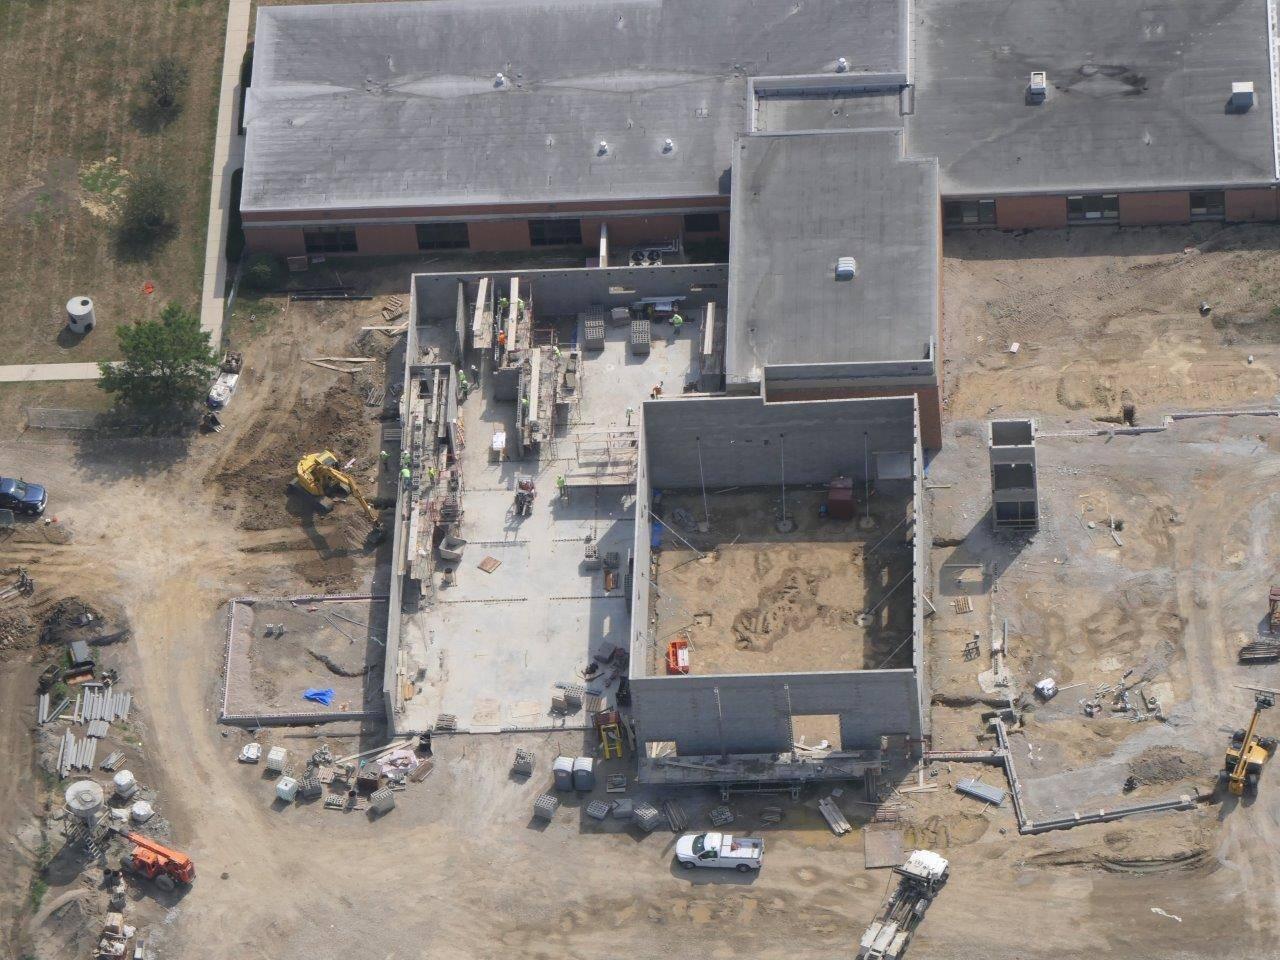 Progress on the masonry walls for the new Greensivew Elementary School gymnasium